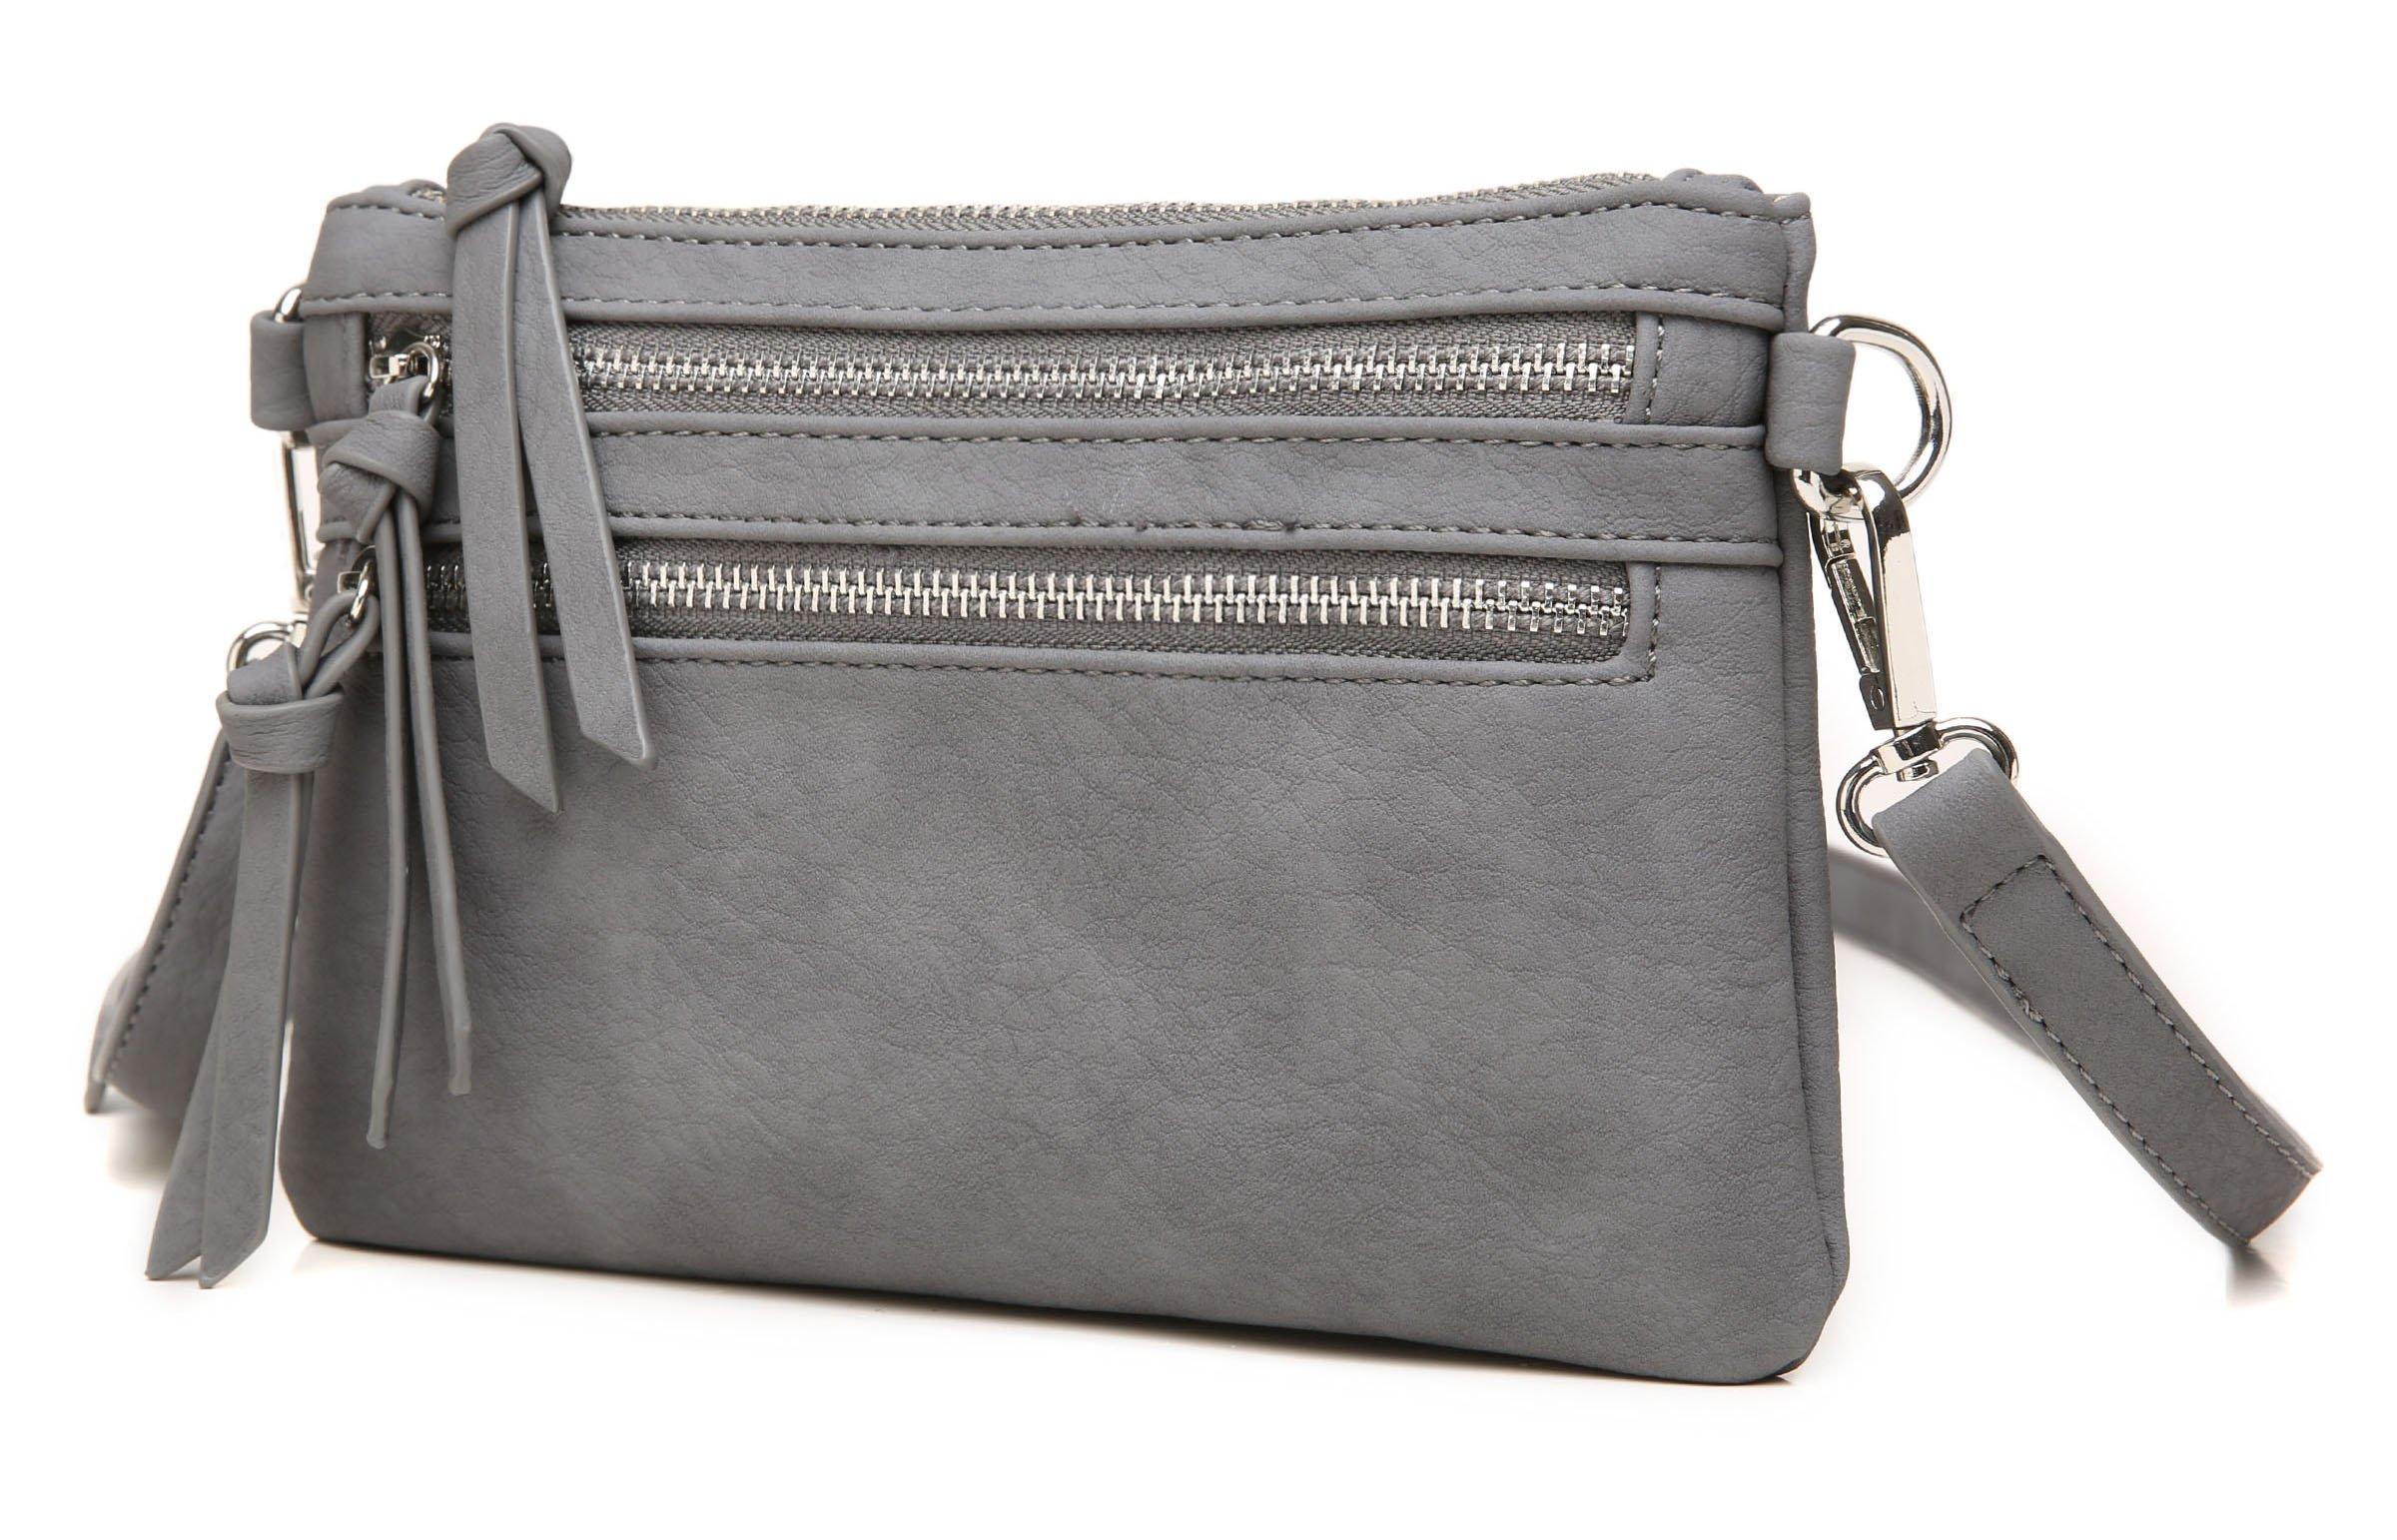 Aitbags Multi-Zipper Pocket Crossbody Handbag Lightweight Purse Functional Clutch with Wristlet by Aitbags (Image #2)